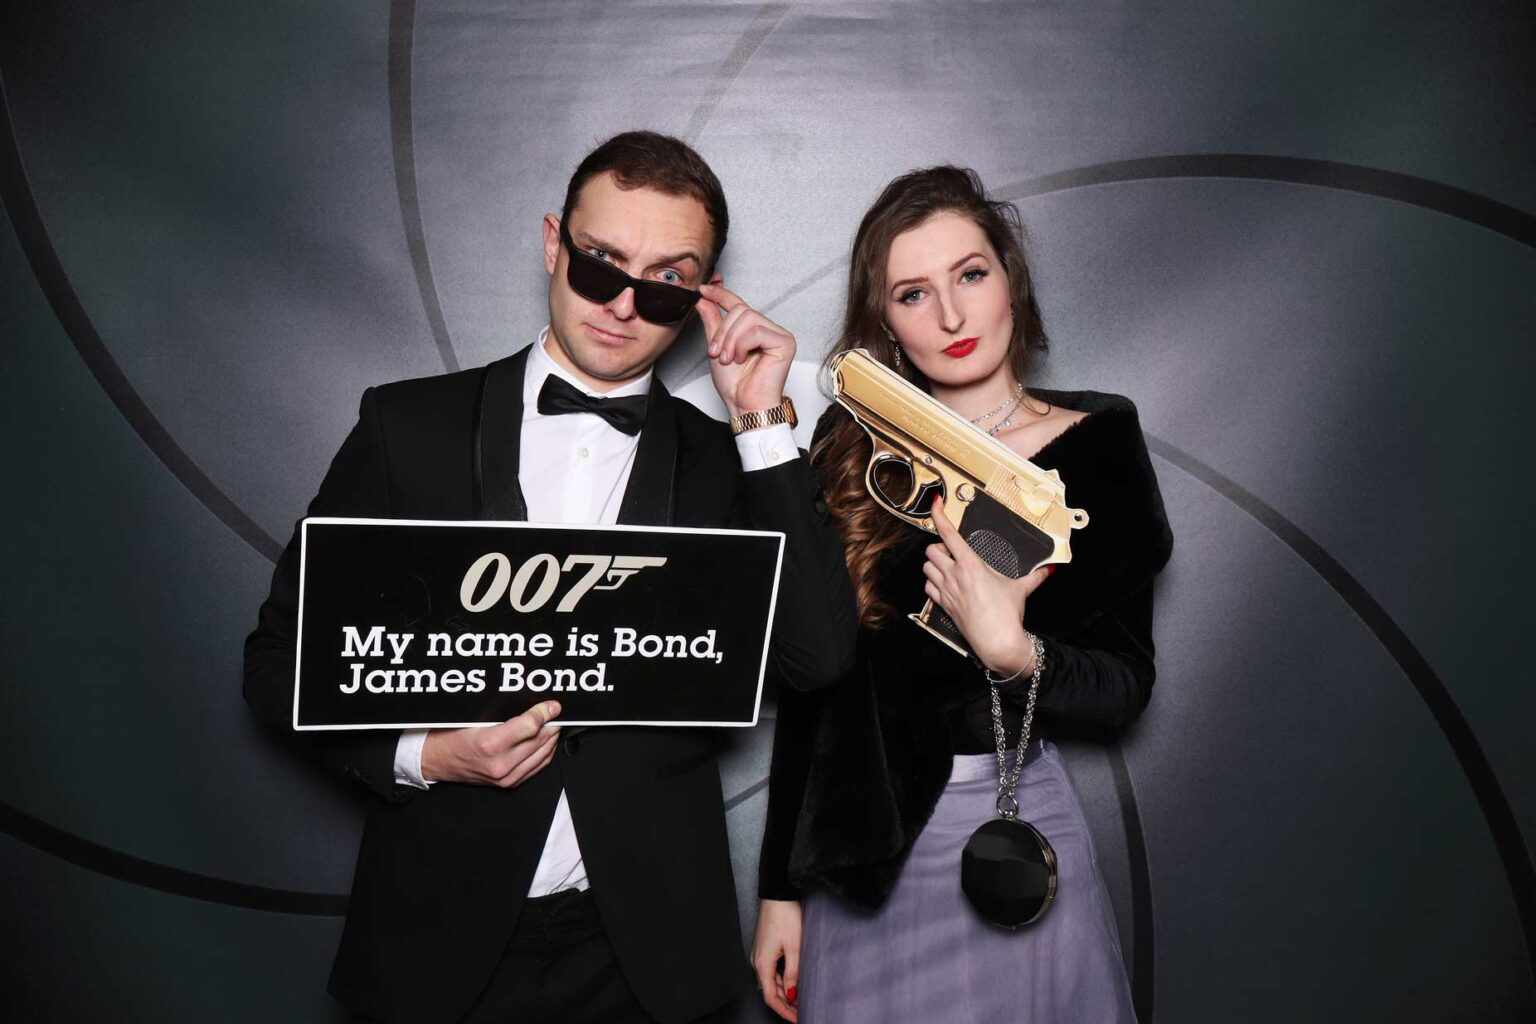 Fotostena James Bond - rekvizity 007 - fotokútik na večierok.